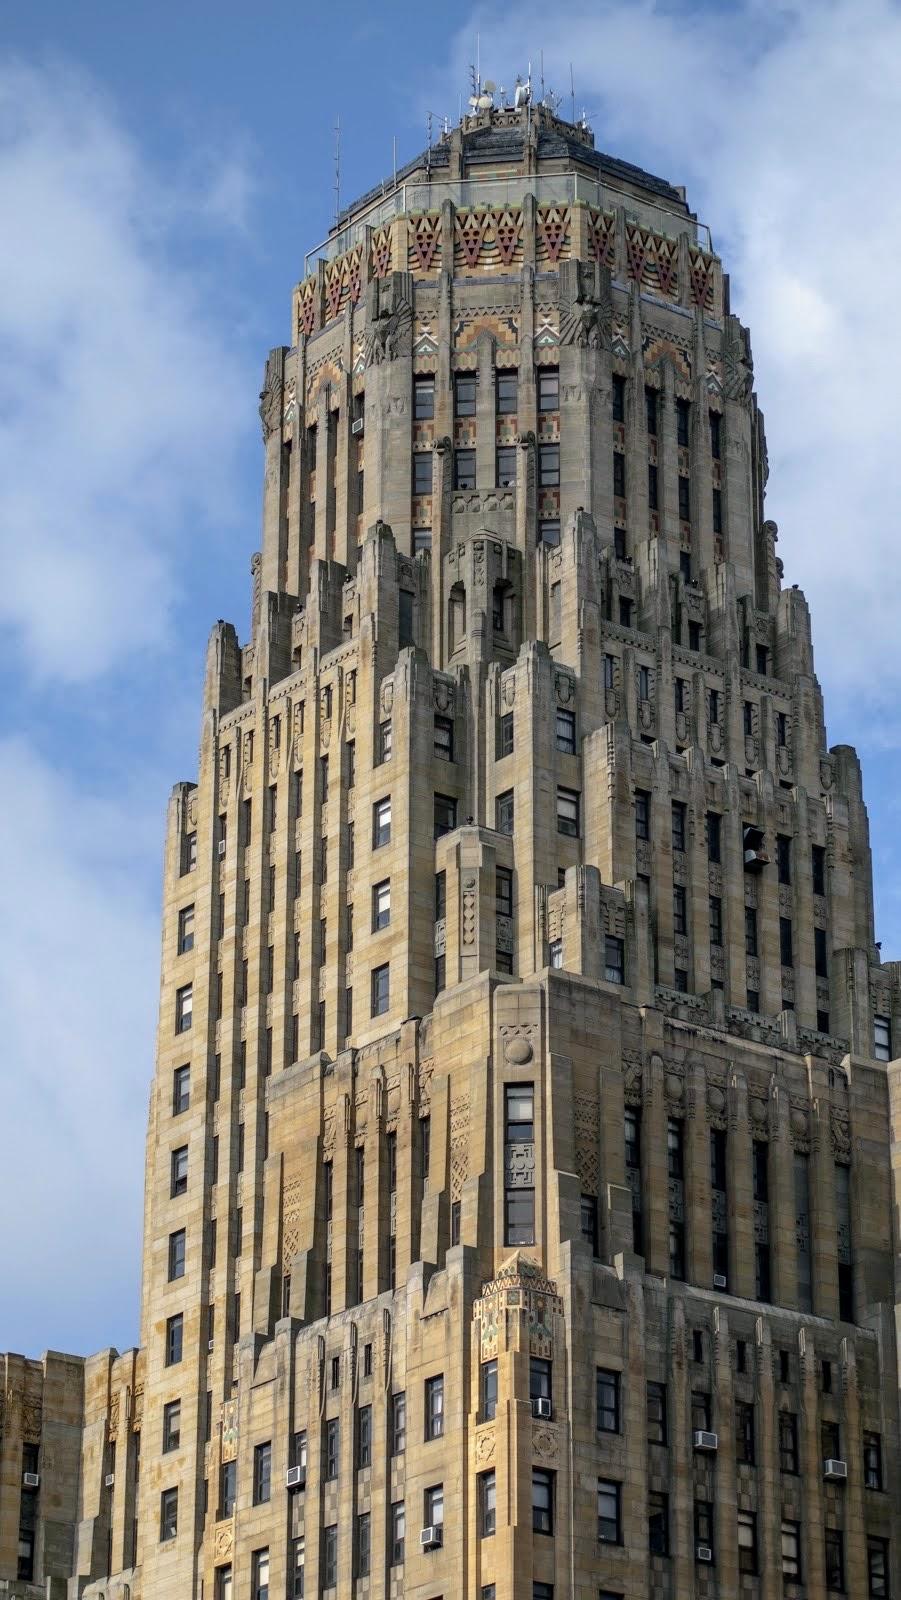 Explore the architecture of Buffalo: Art Deco City Hall